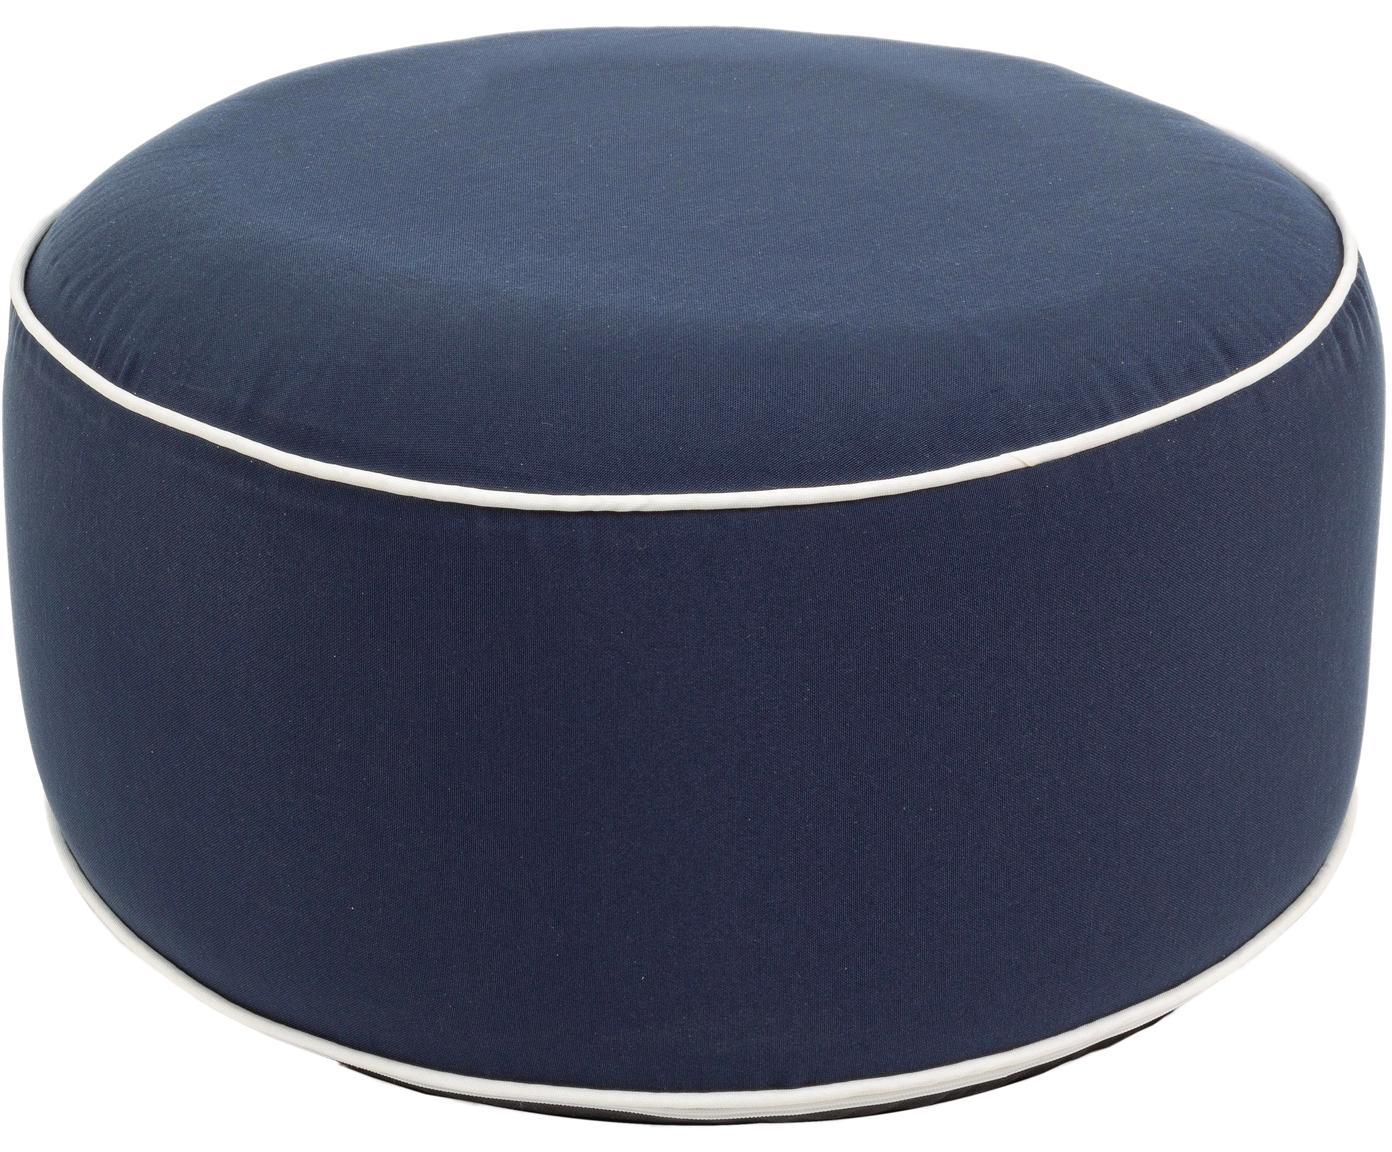 Pouf da esterno Rihanna, Blu, bianco, Ø 53 x Alt. 23 cm